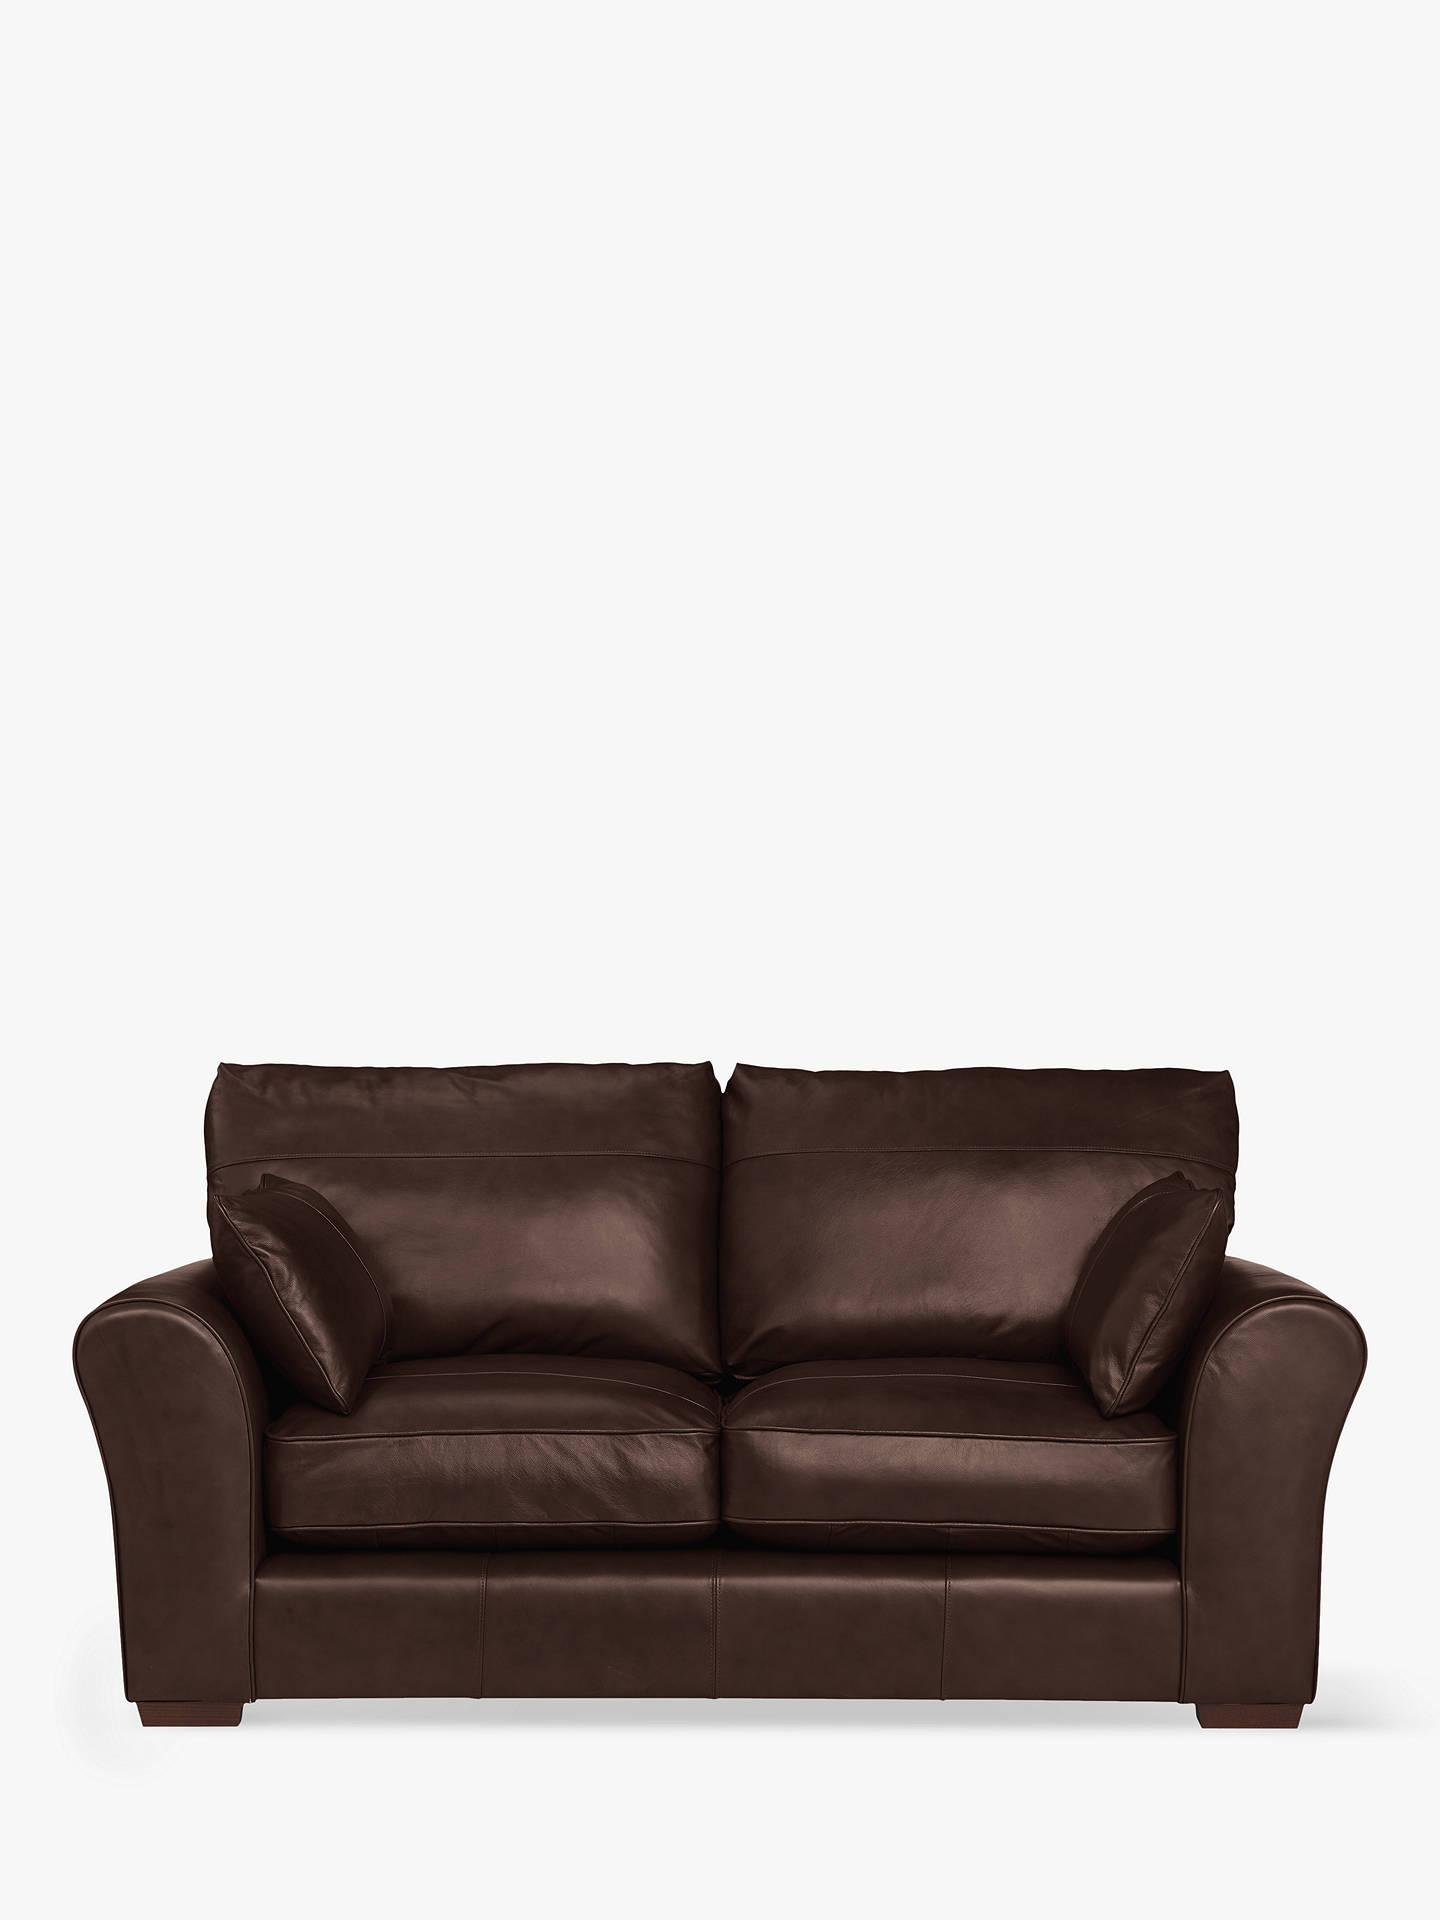 Sofas Leon Mndw John Lewis Partners Leon Medium 2 Seater Leather sofa Dark Leg